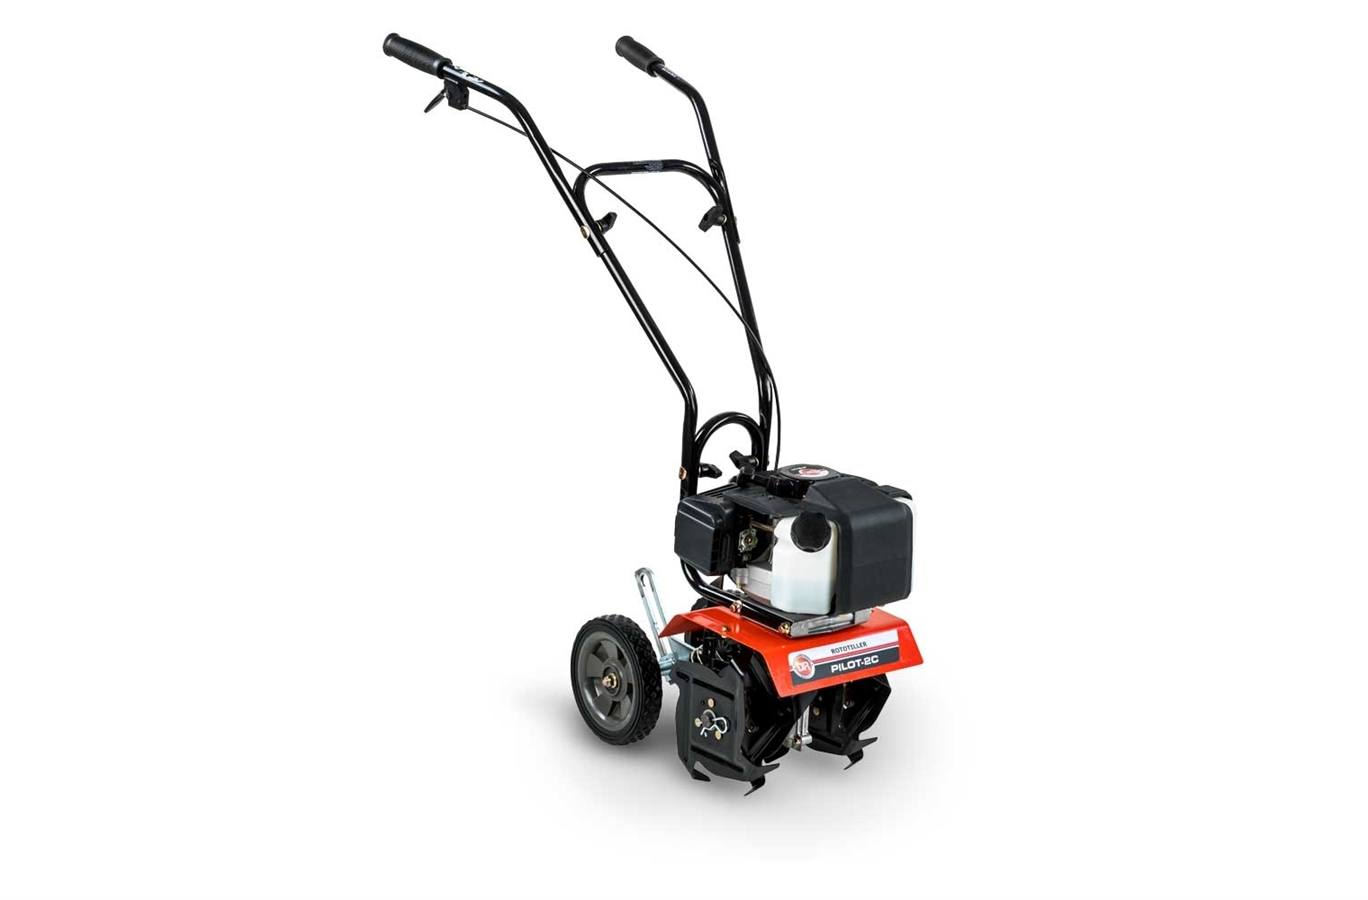 2019 DR Power TW13020DMN DR Mini Tiller Cultivator